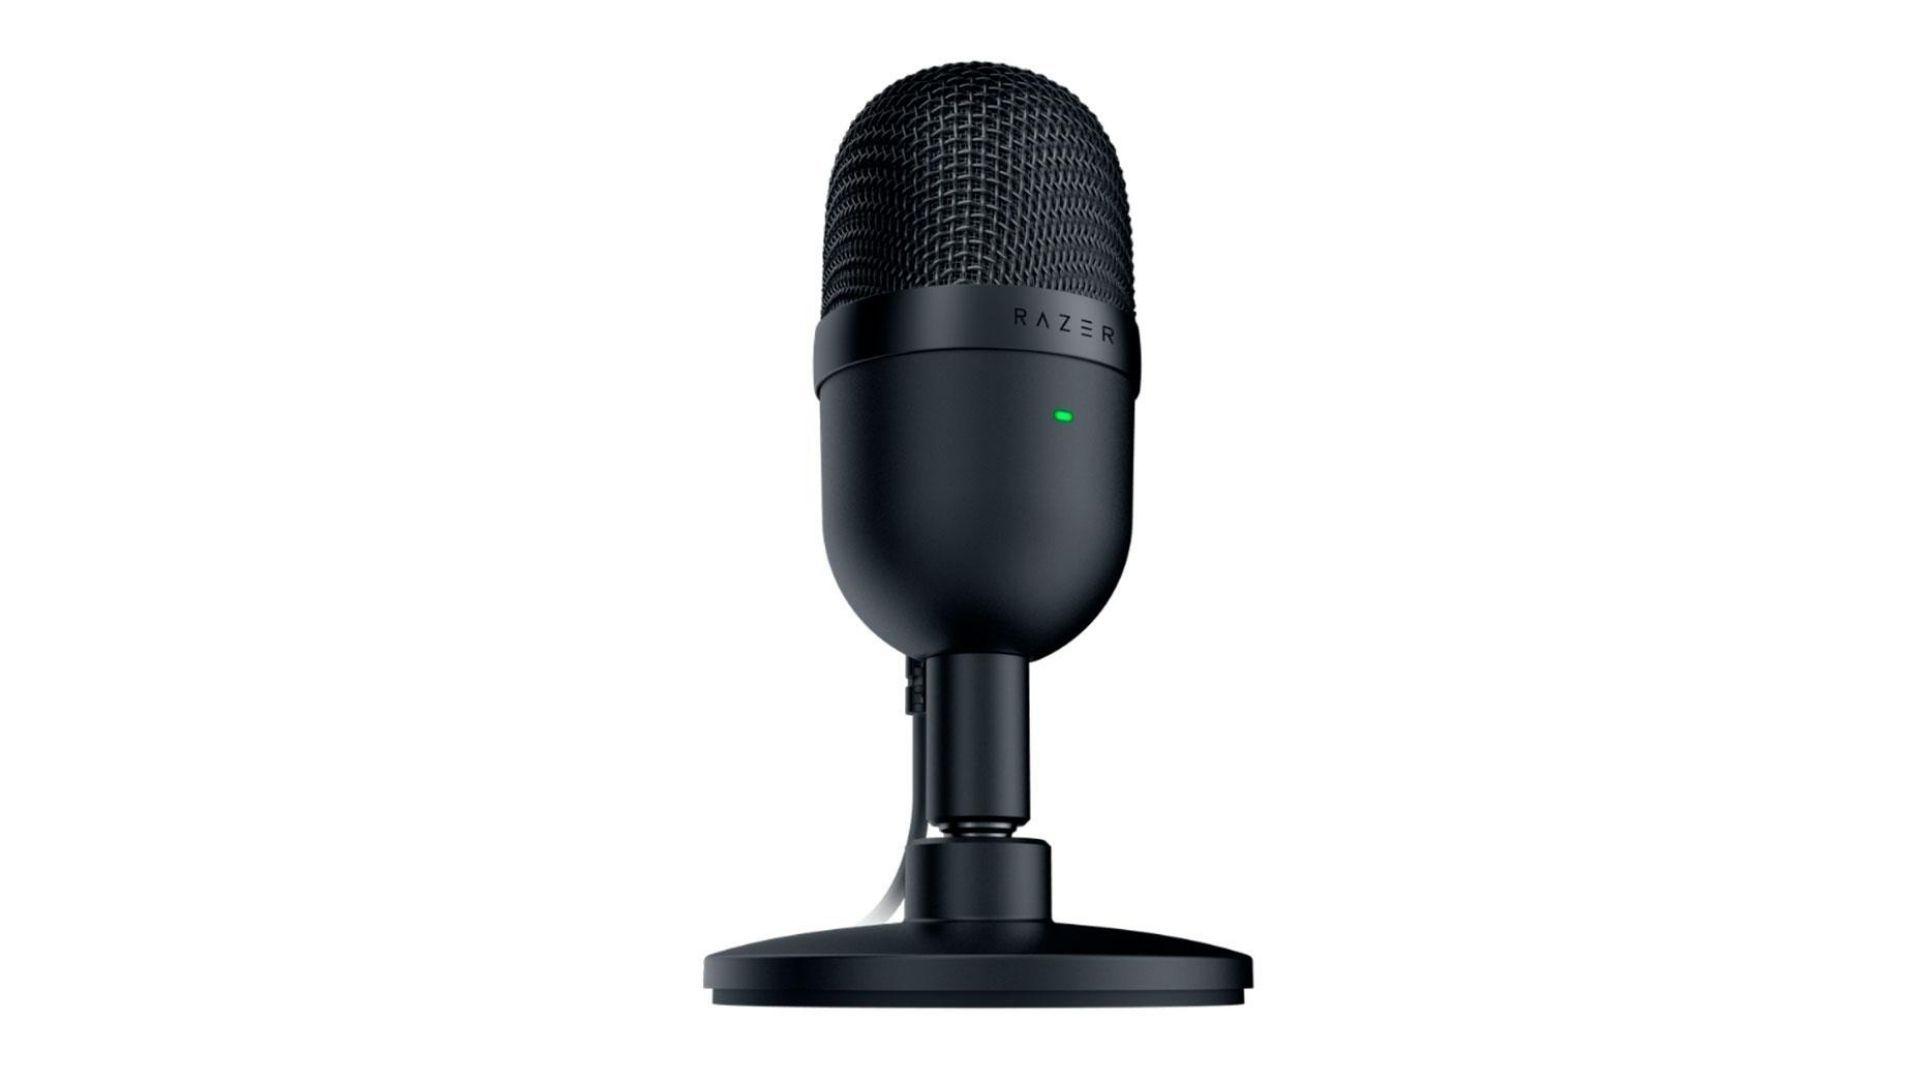 Microfone Razer Seiren Mini preto